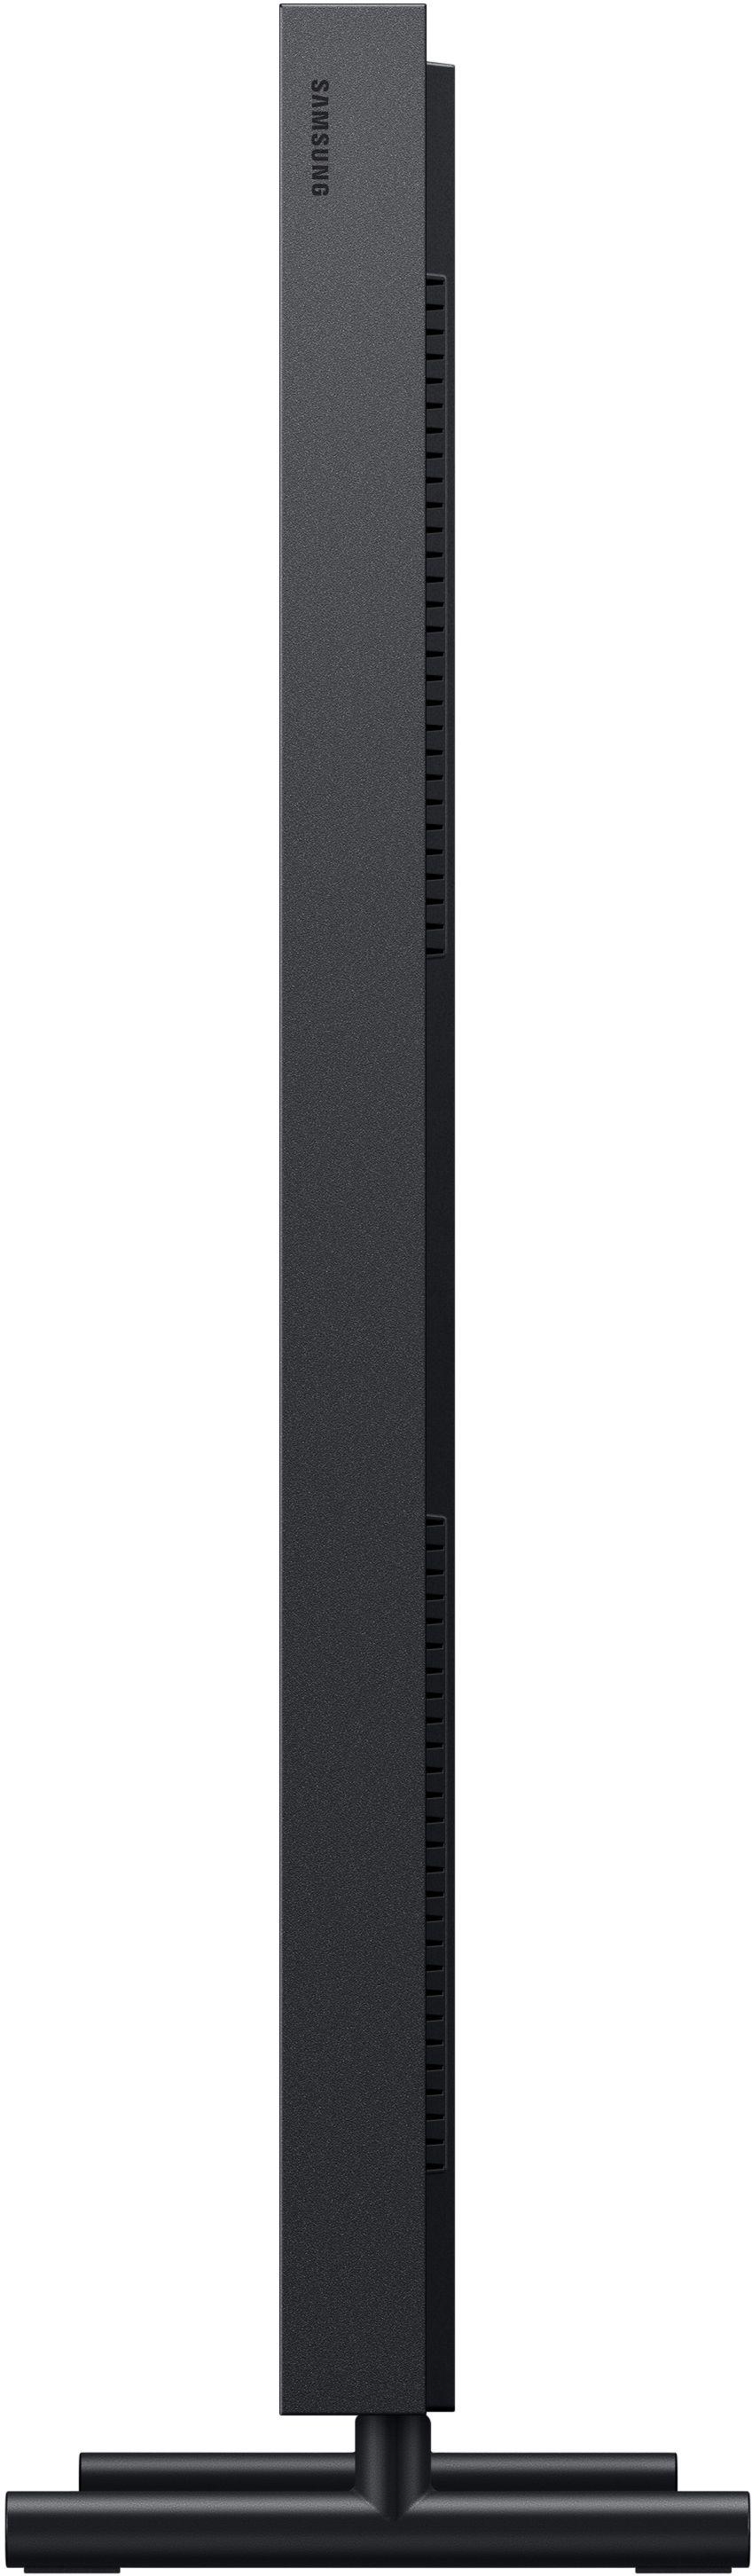 Телевизор Samsung QE43LS03RAUXUA от Територія твоєї техніки - 4